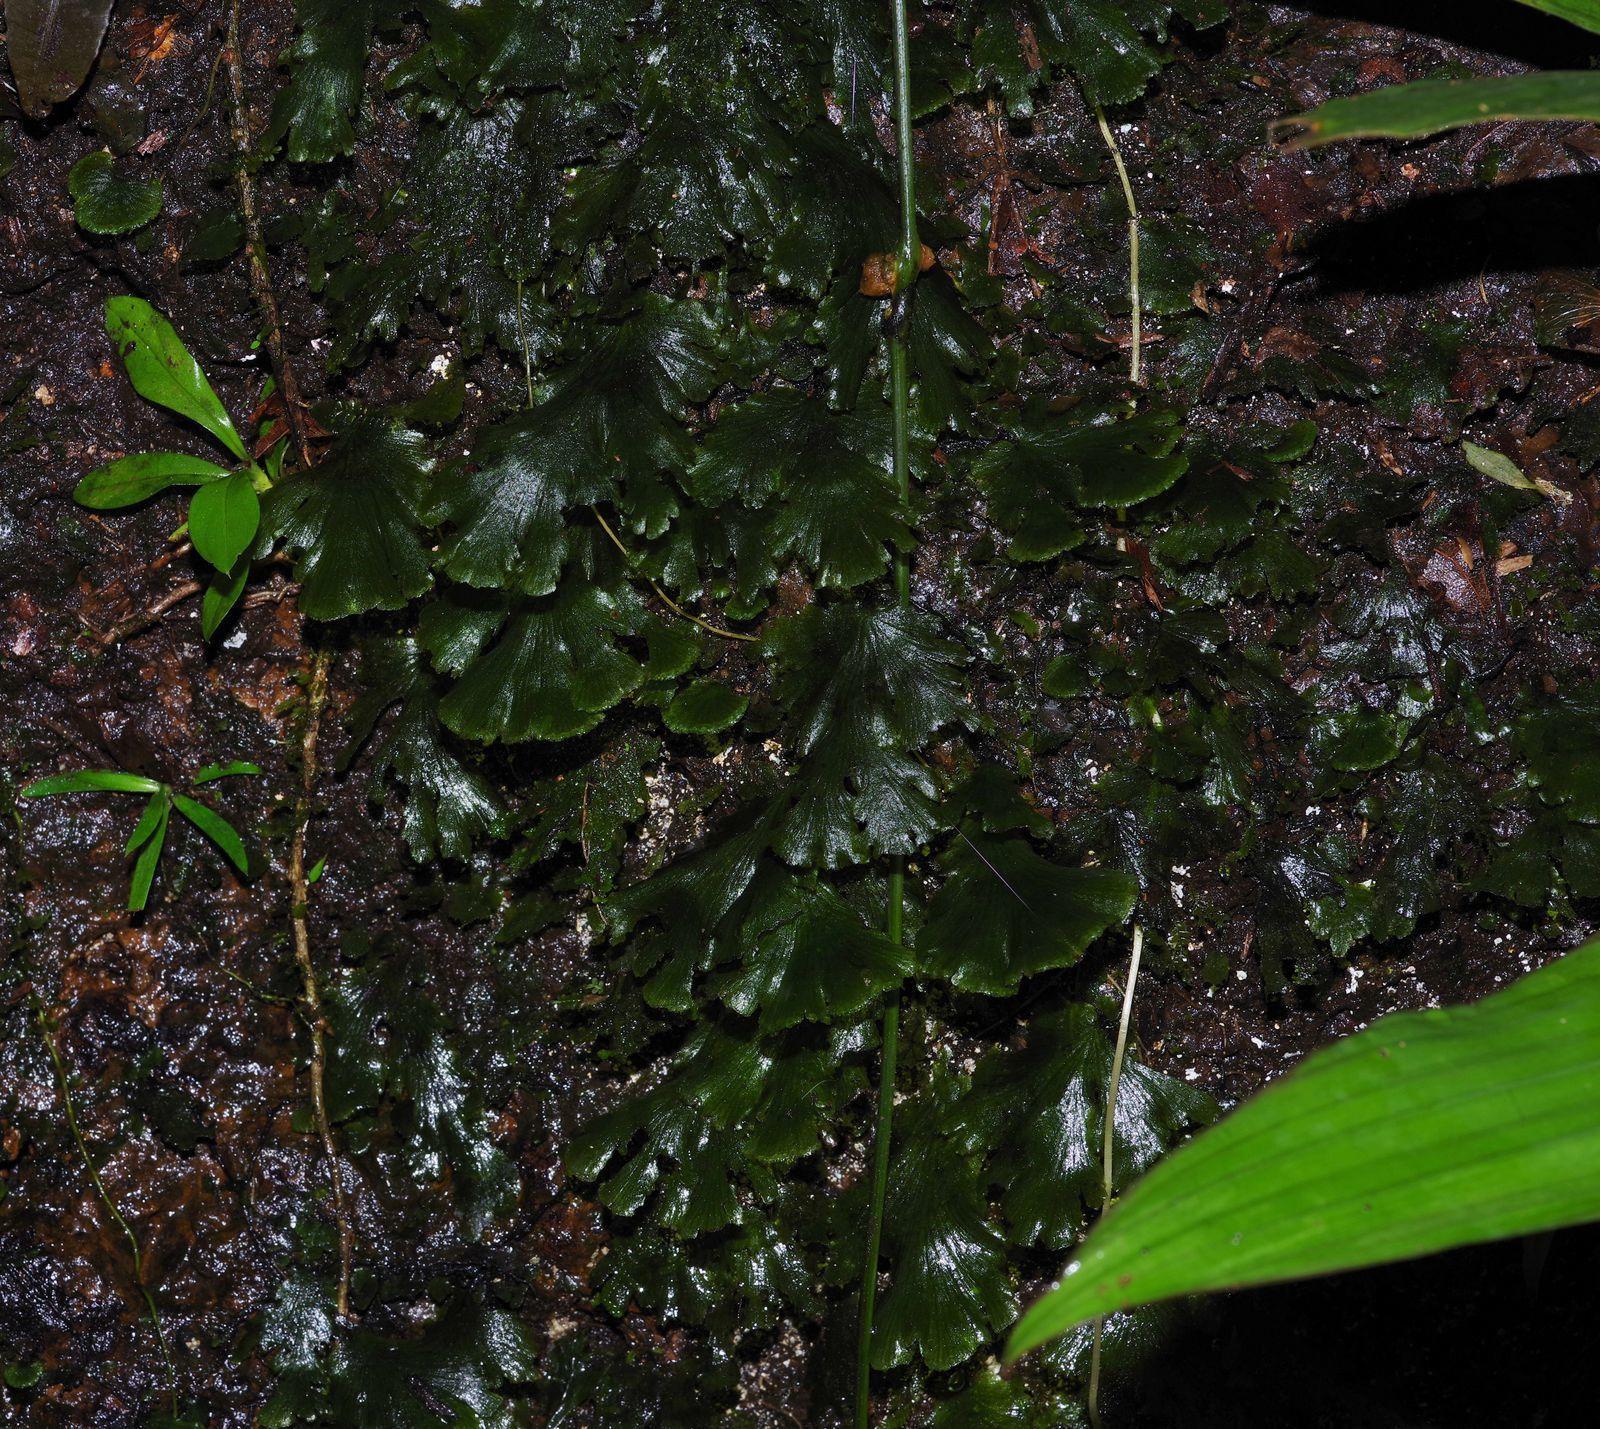 Didymoglossum membranaceum